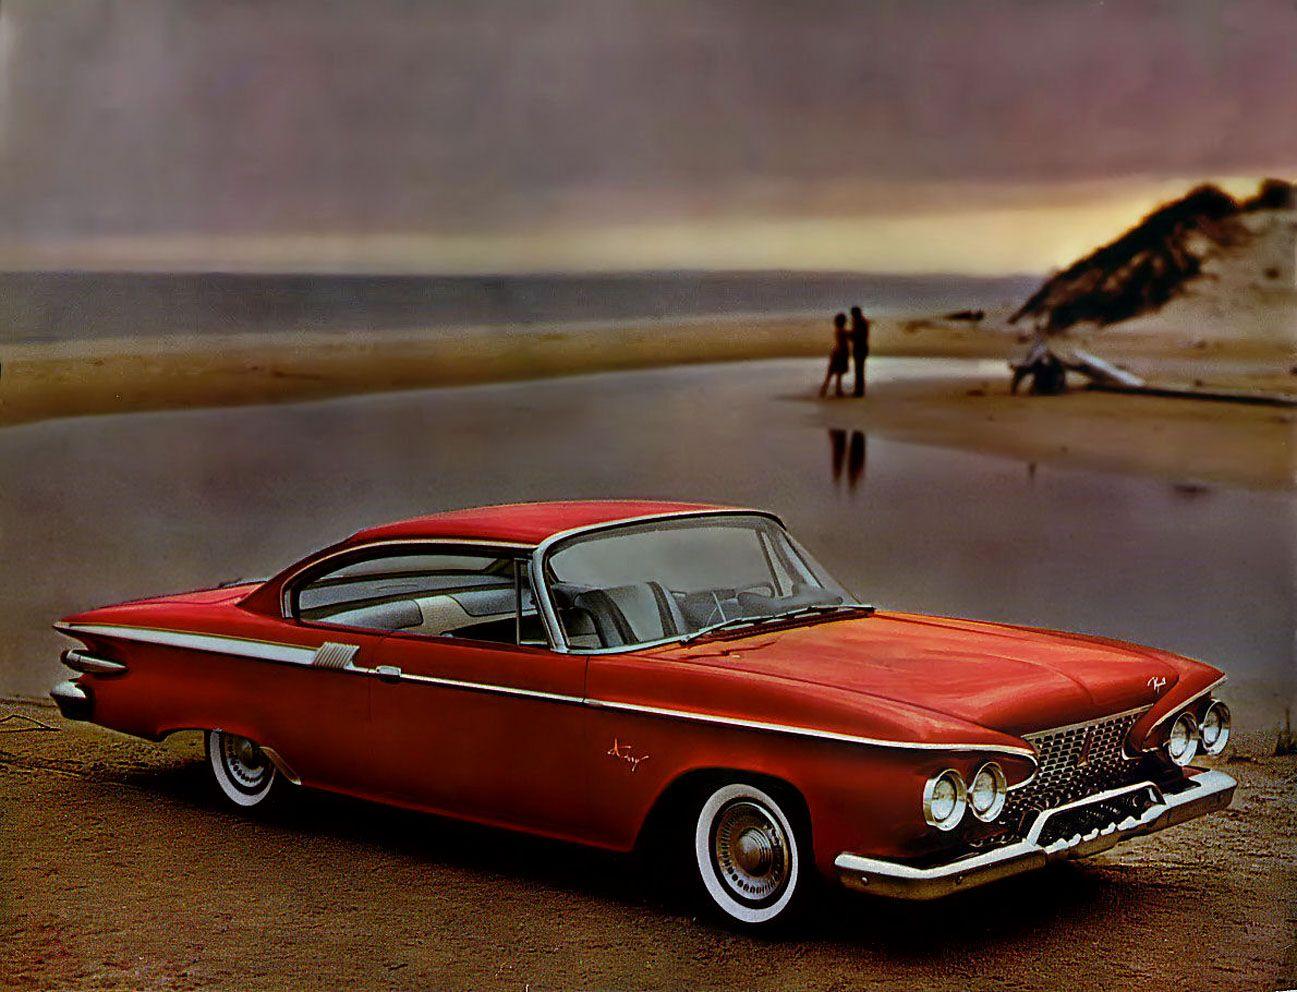 Vintage Pin Up Car